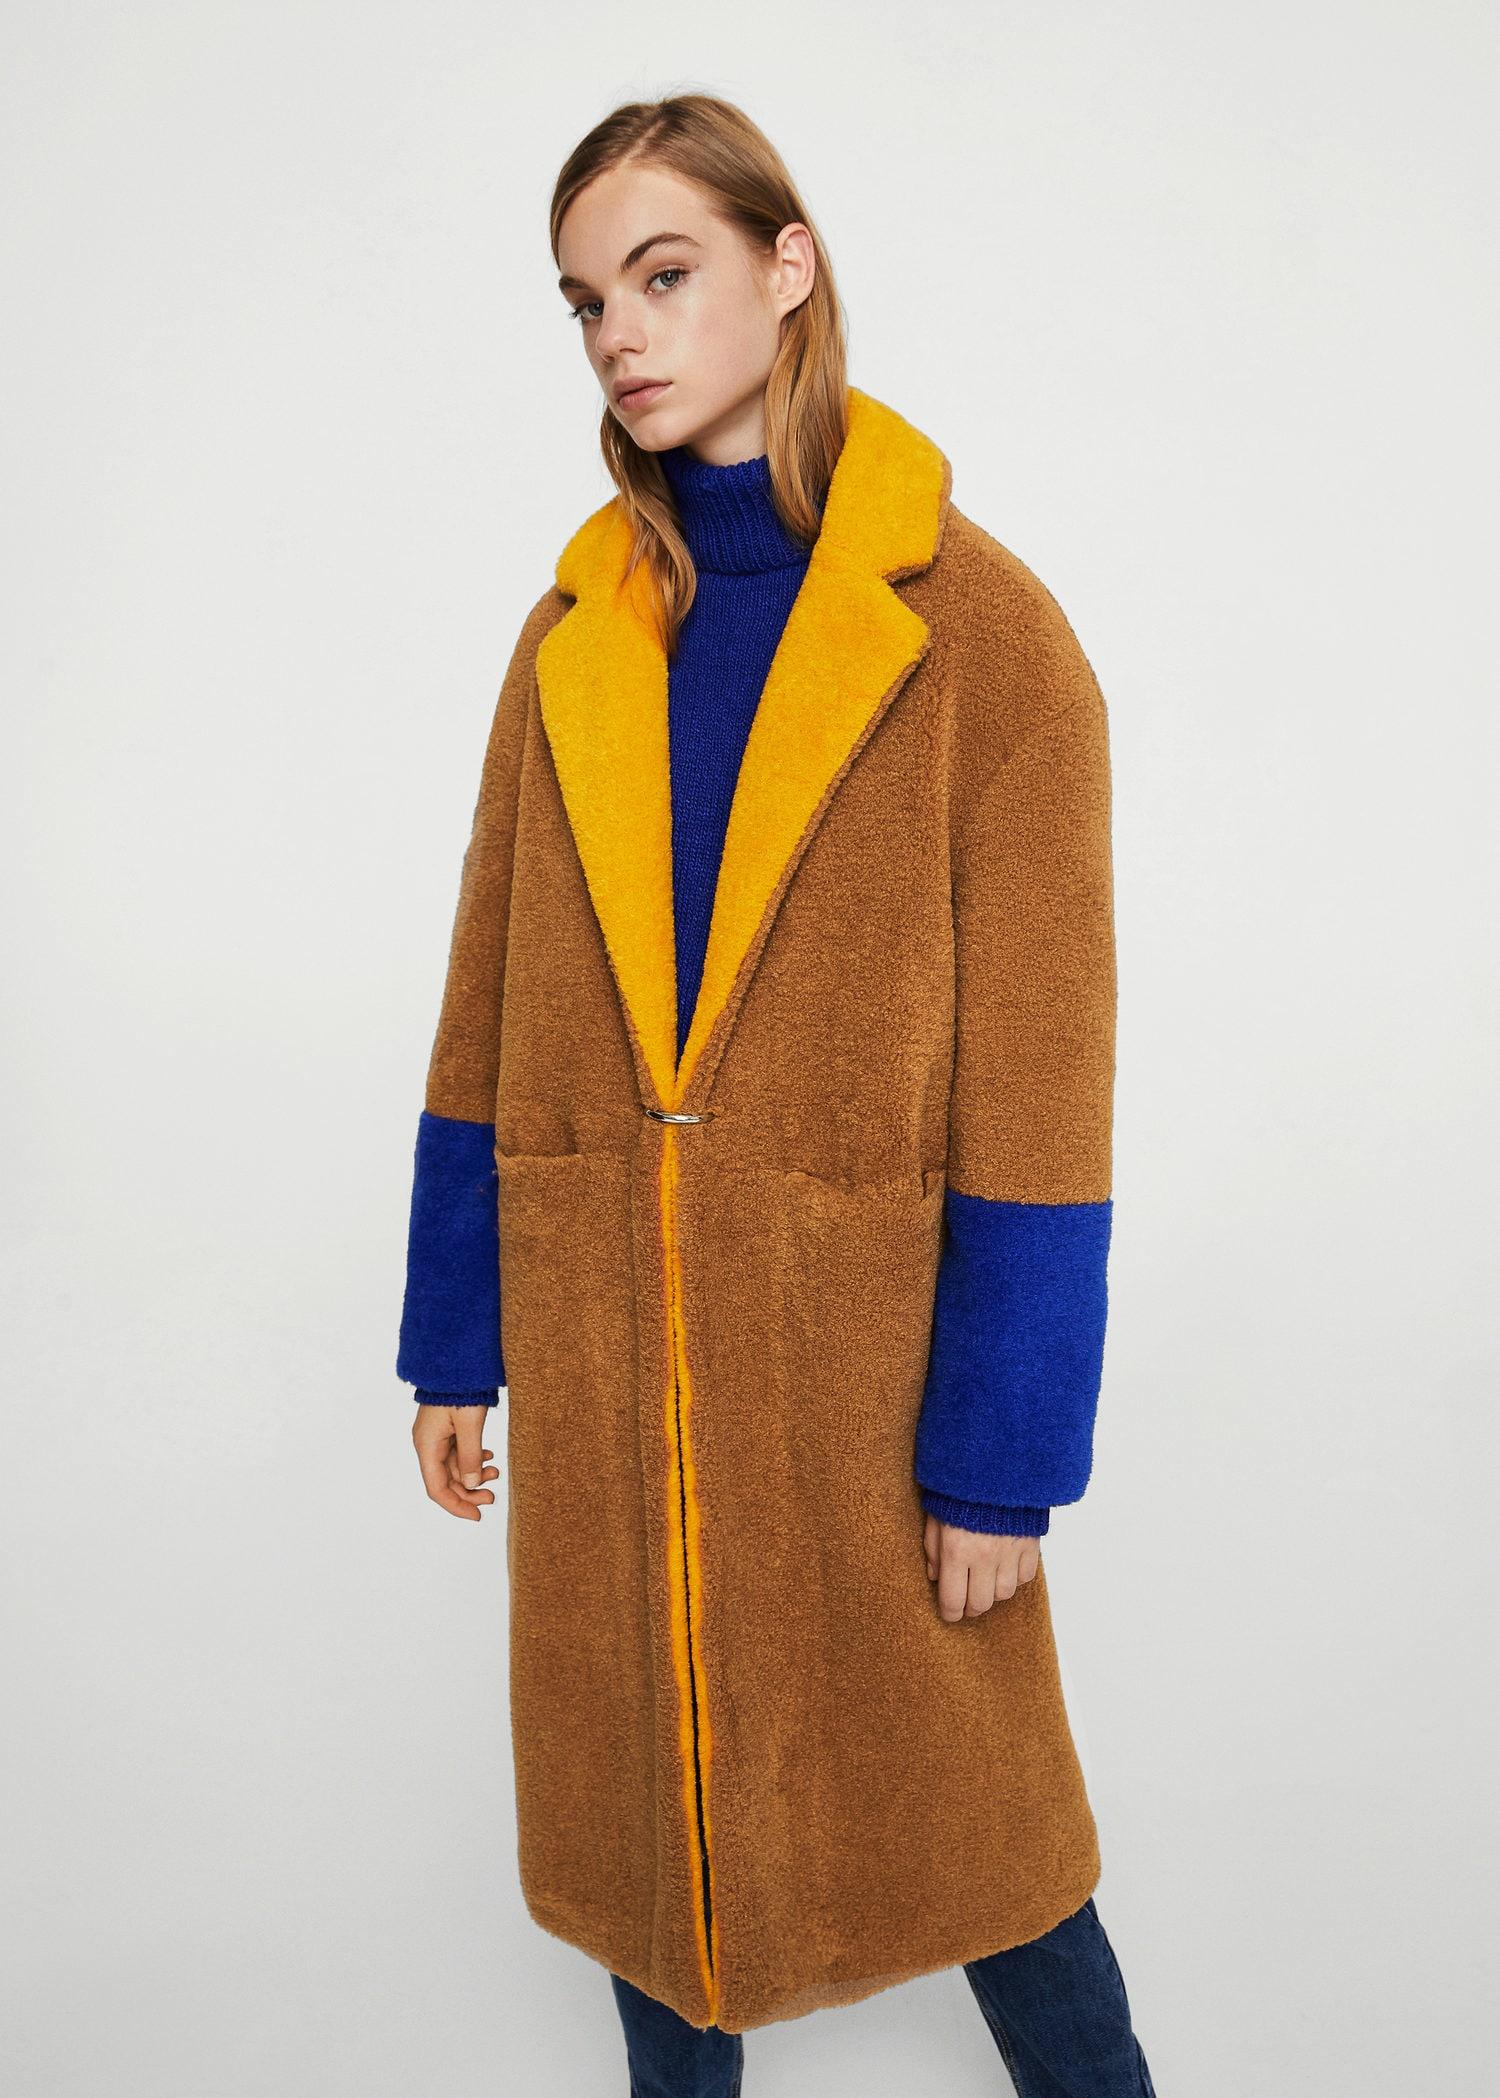 Neuankömmling Fabrik Kunden zuerst Kontrastierender kunstfell-mantel - Damen | MANGO Deutschland